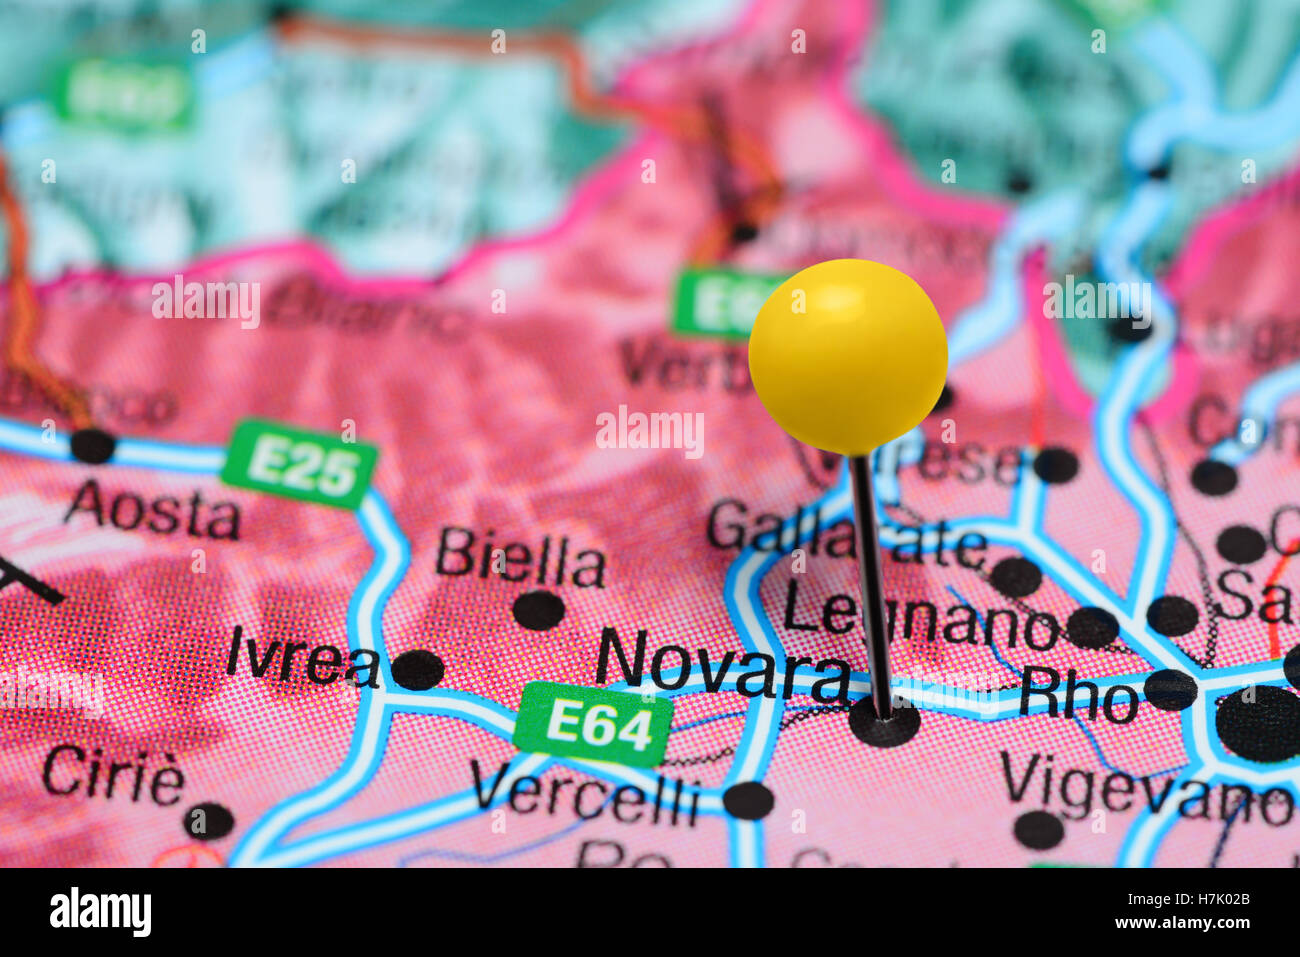 Novara pinned on a map of Italy Stock Photo Royalty Free Image